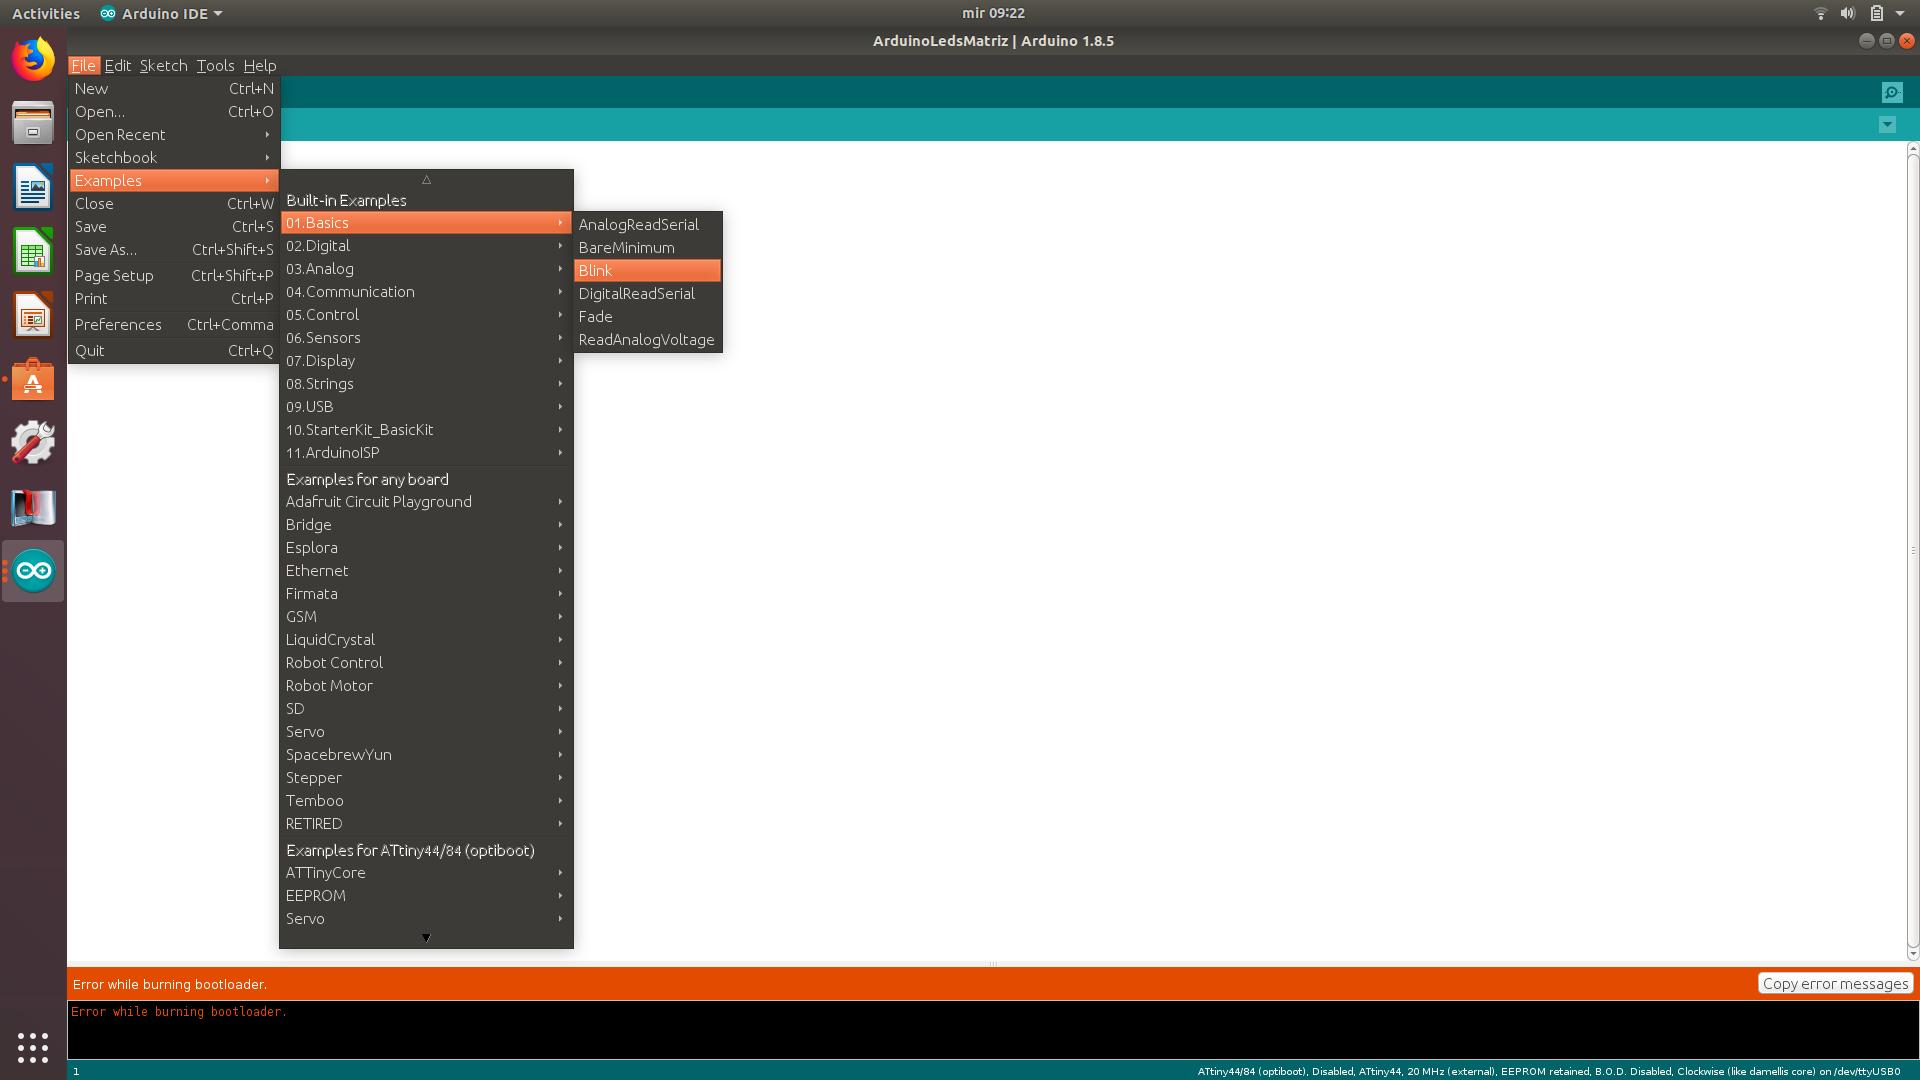 Ale Rivadeneyra - Embedded programming